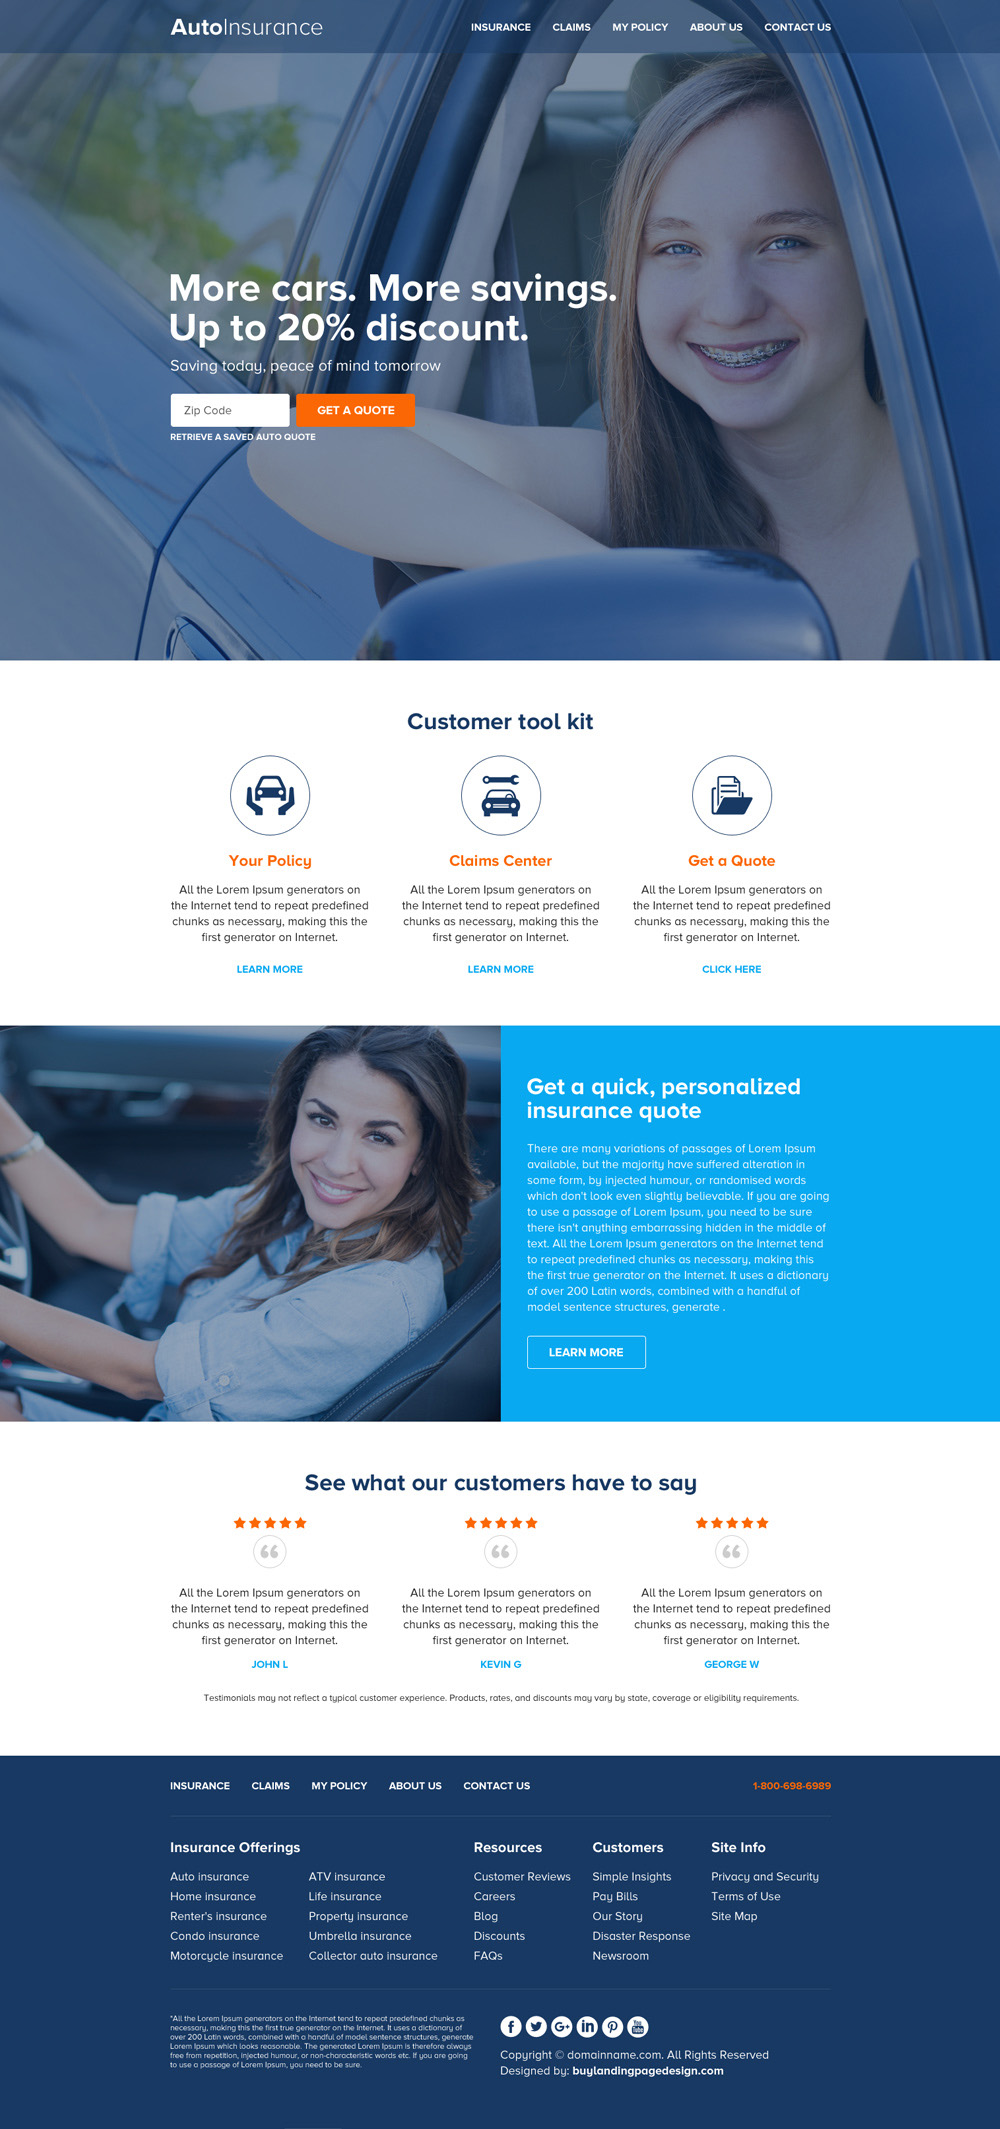 15 discount on website design for Best discount designer websites